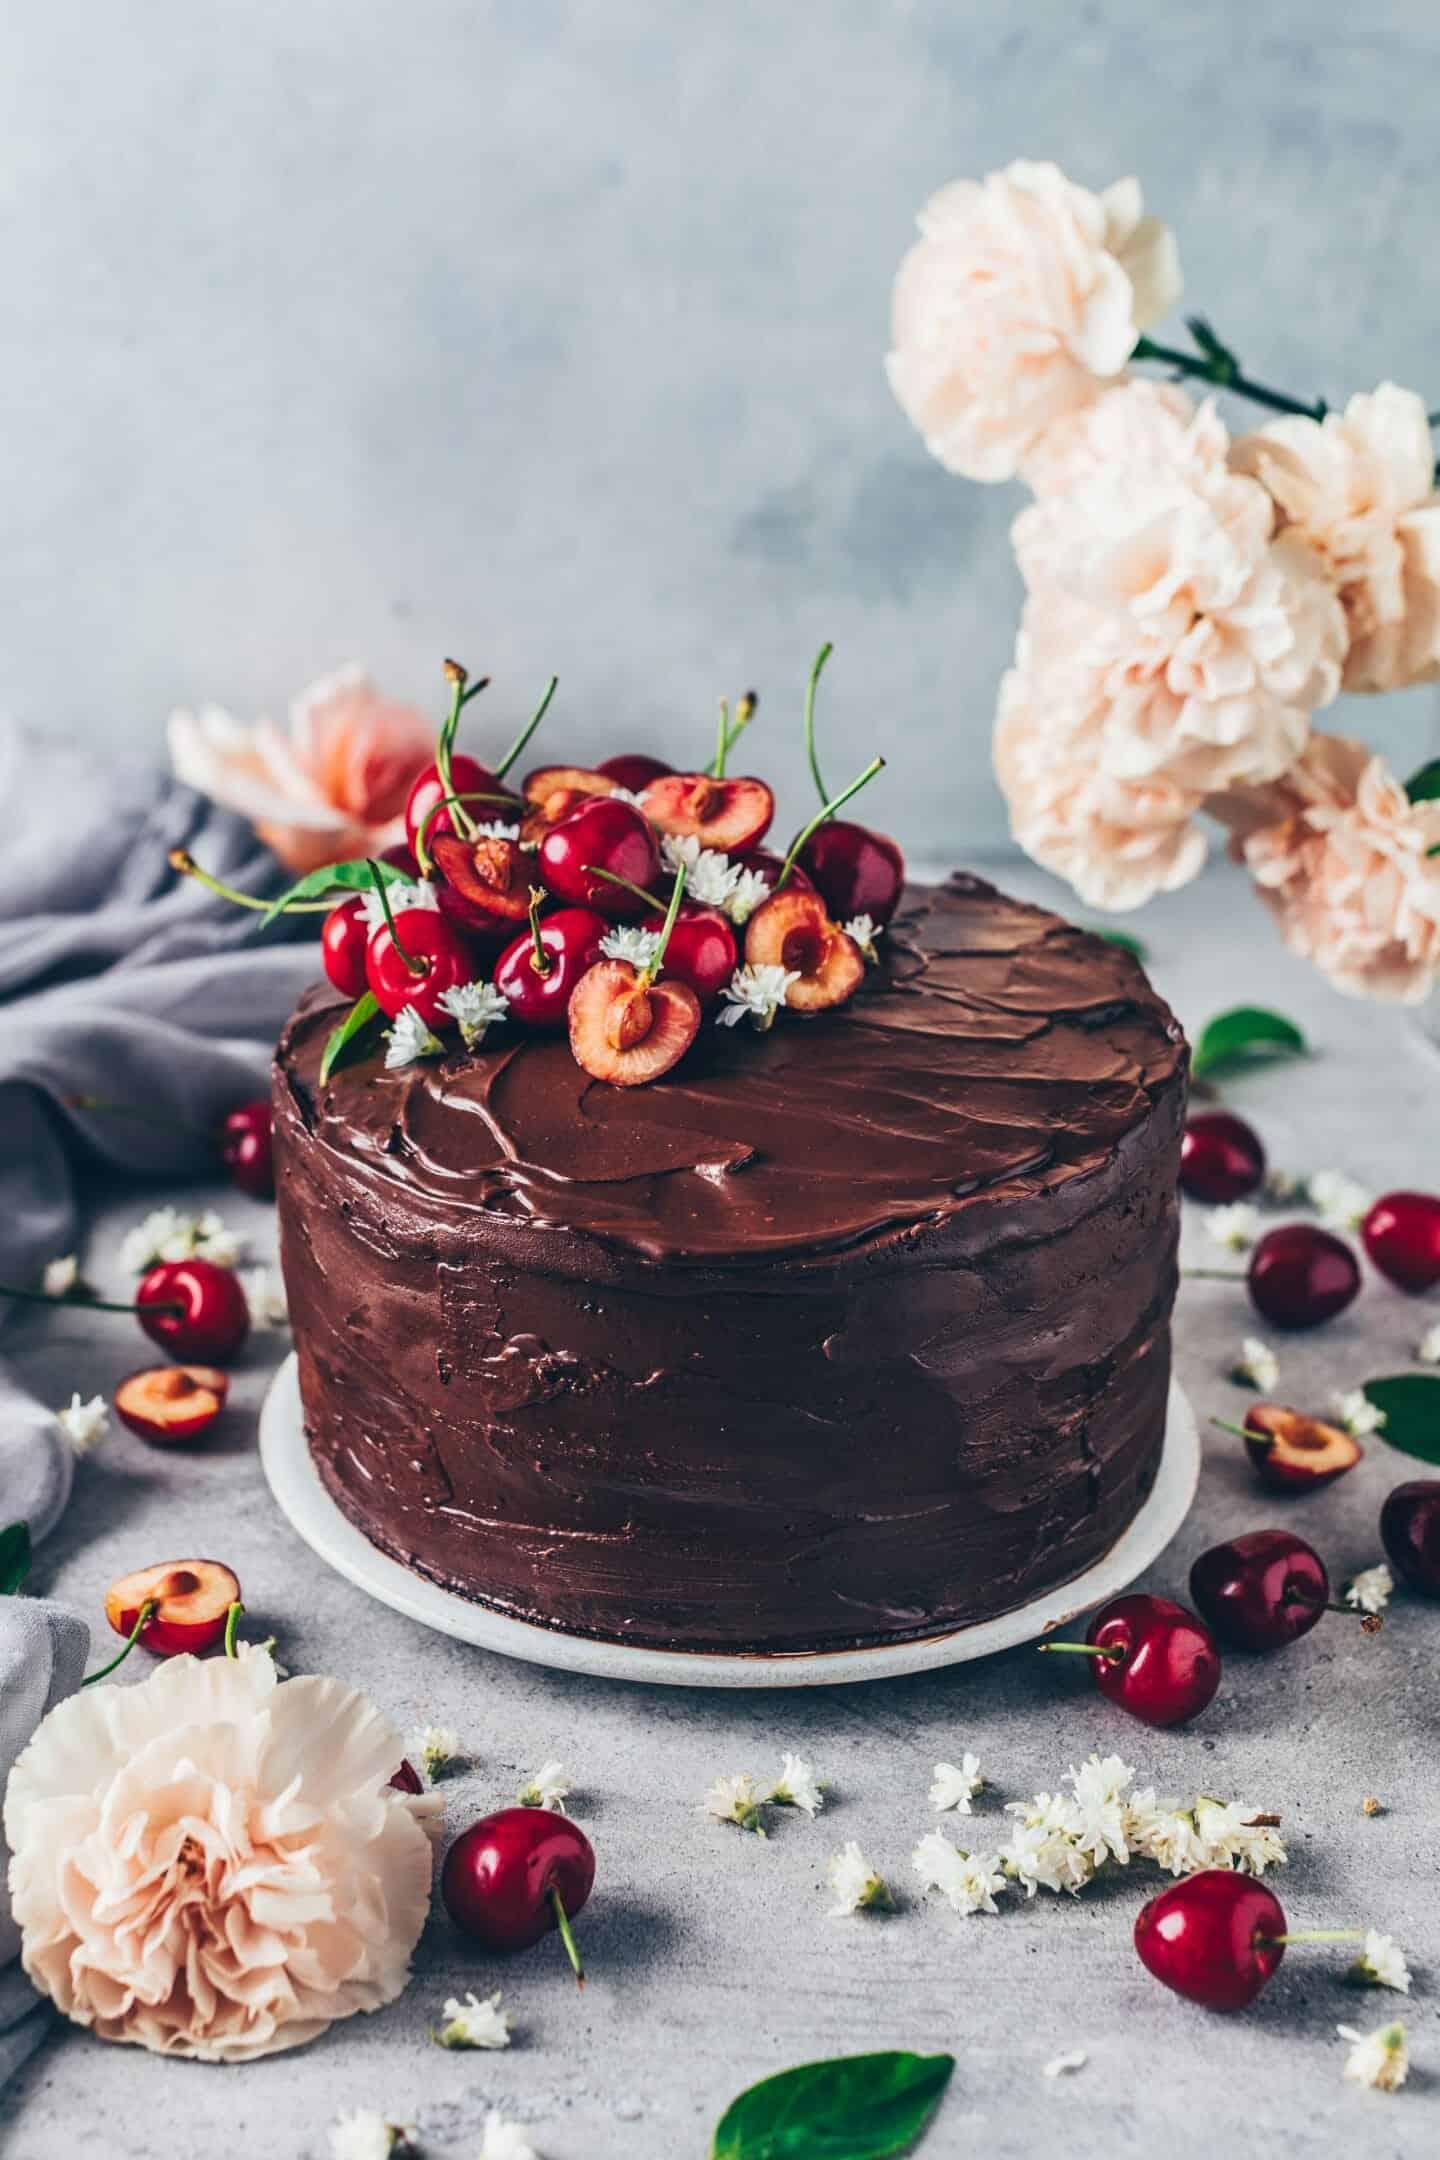 Veganer Schokoladenkuchen Das Beste Rezept Bianca Zapatka Foodblog